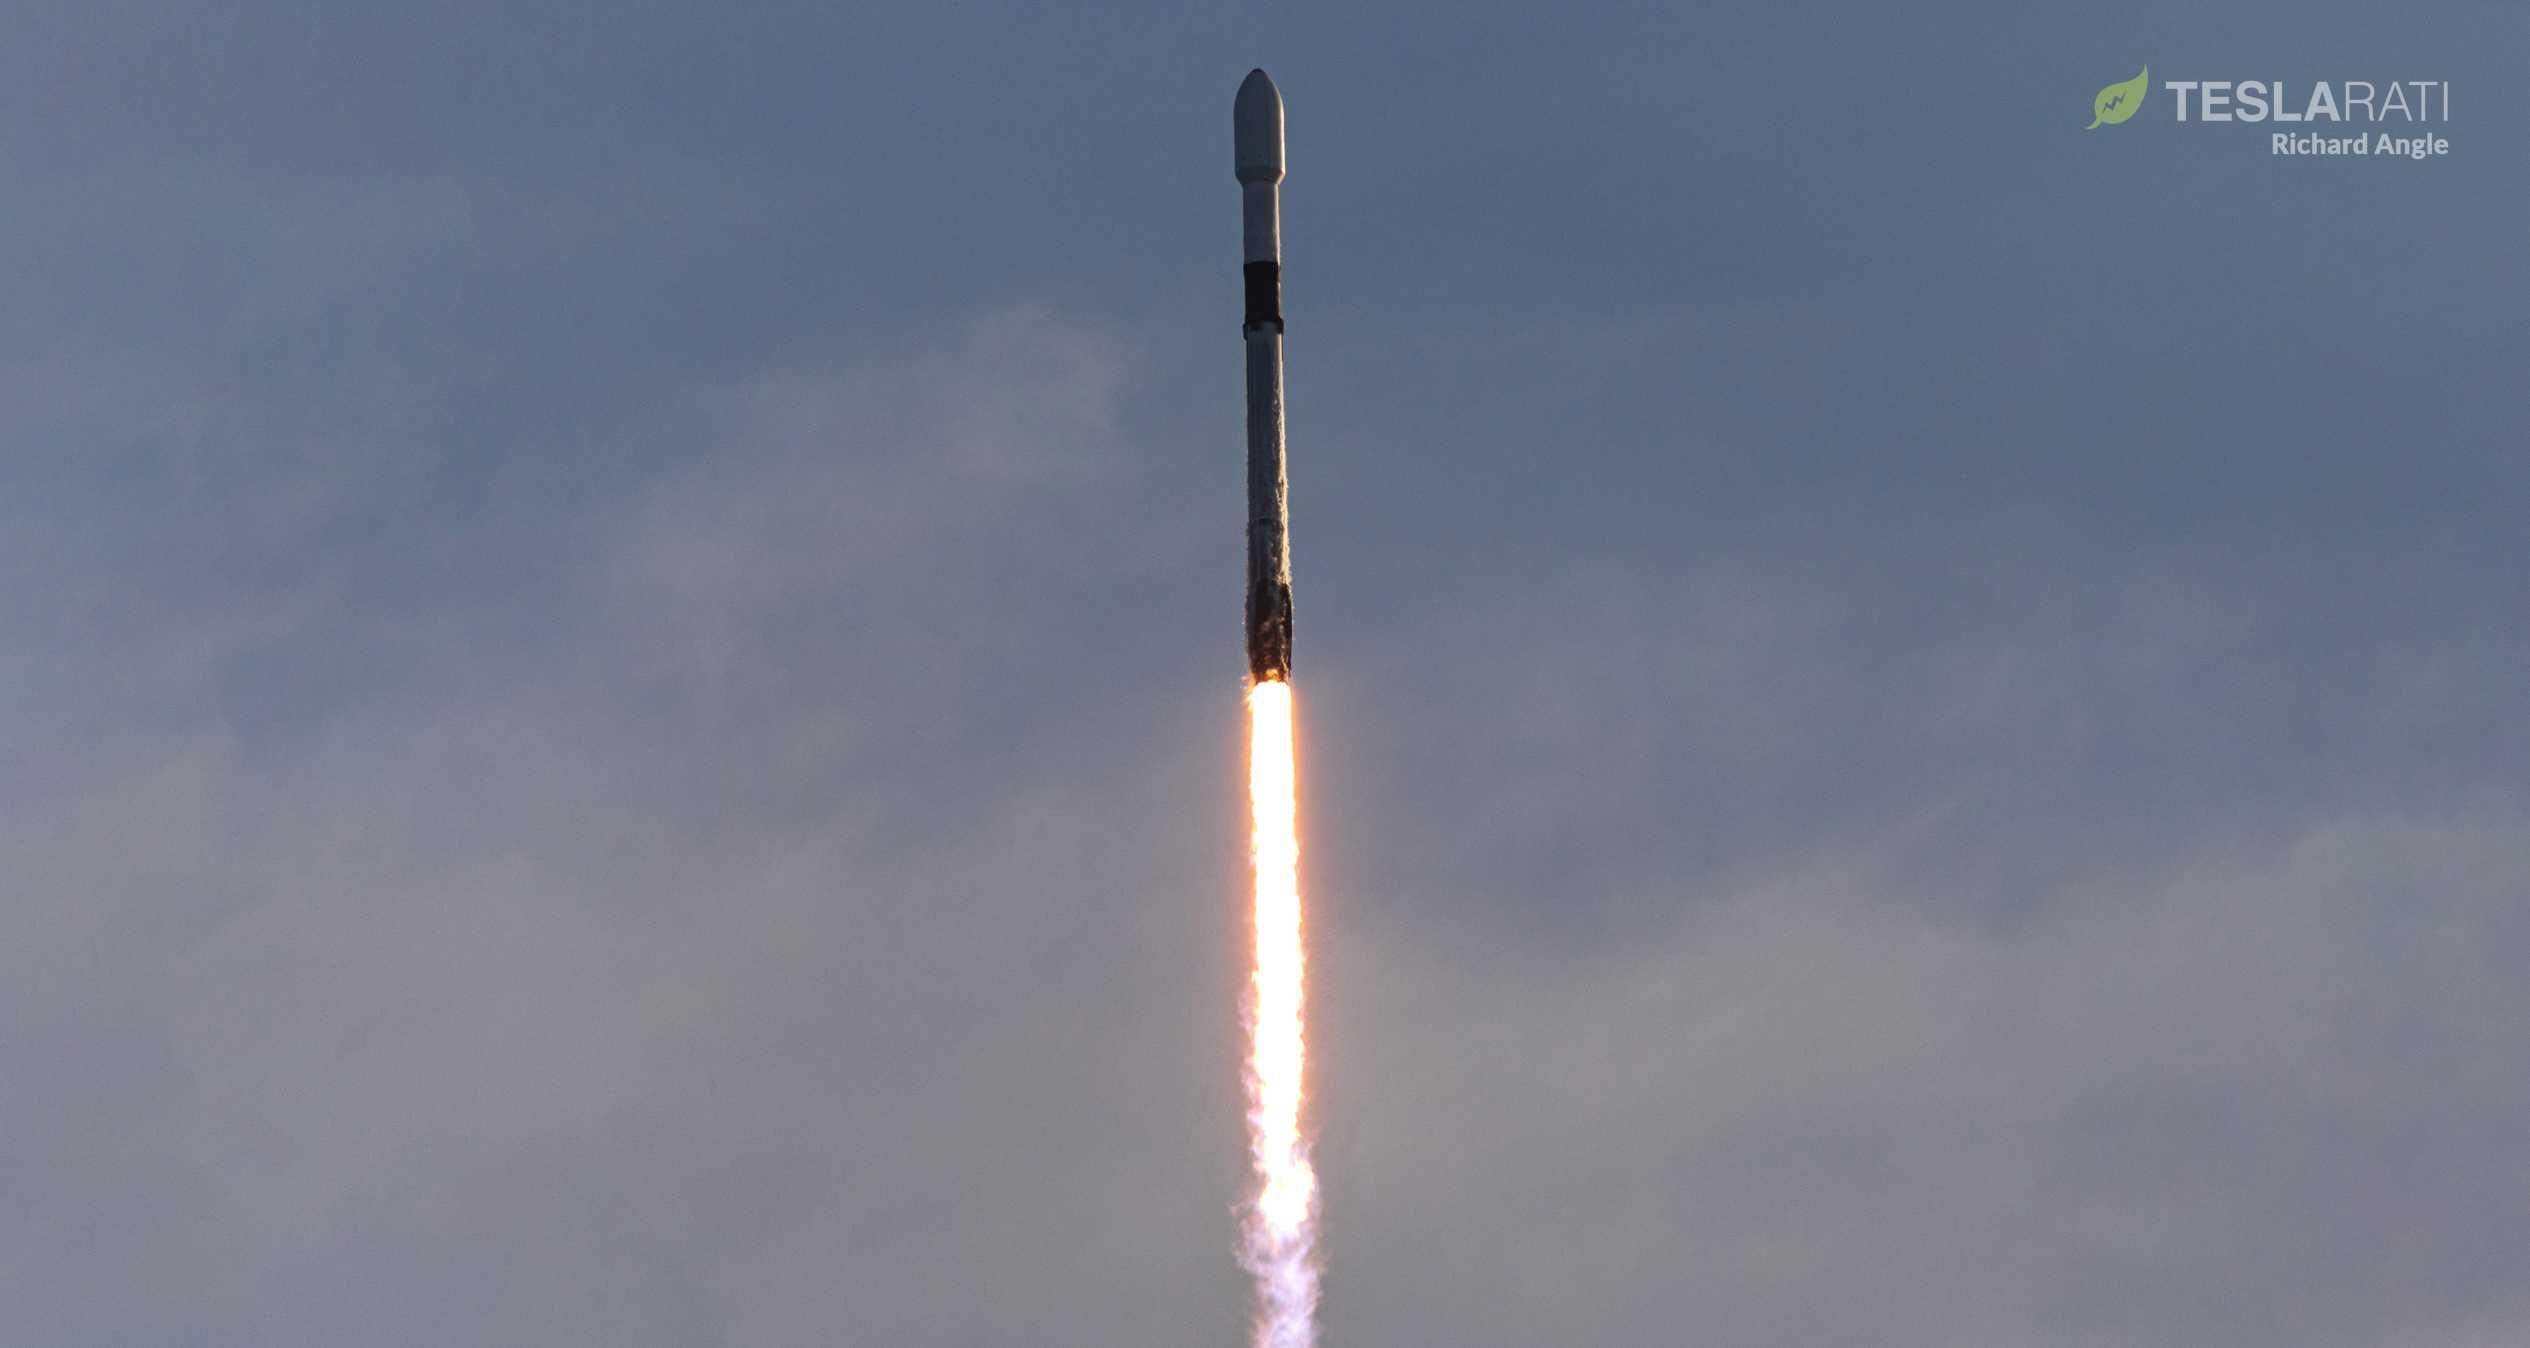 Starlink V1 L5 F9 B1048 39A 031820 (Richard Angle) launch (1) crop-1 (c)